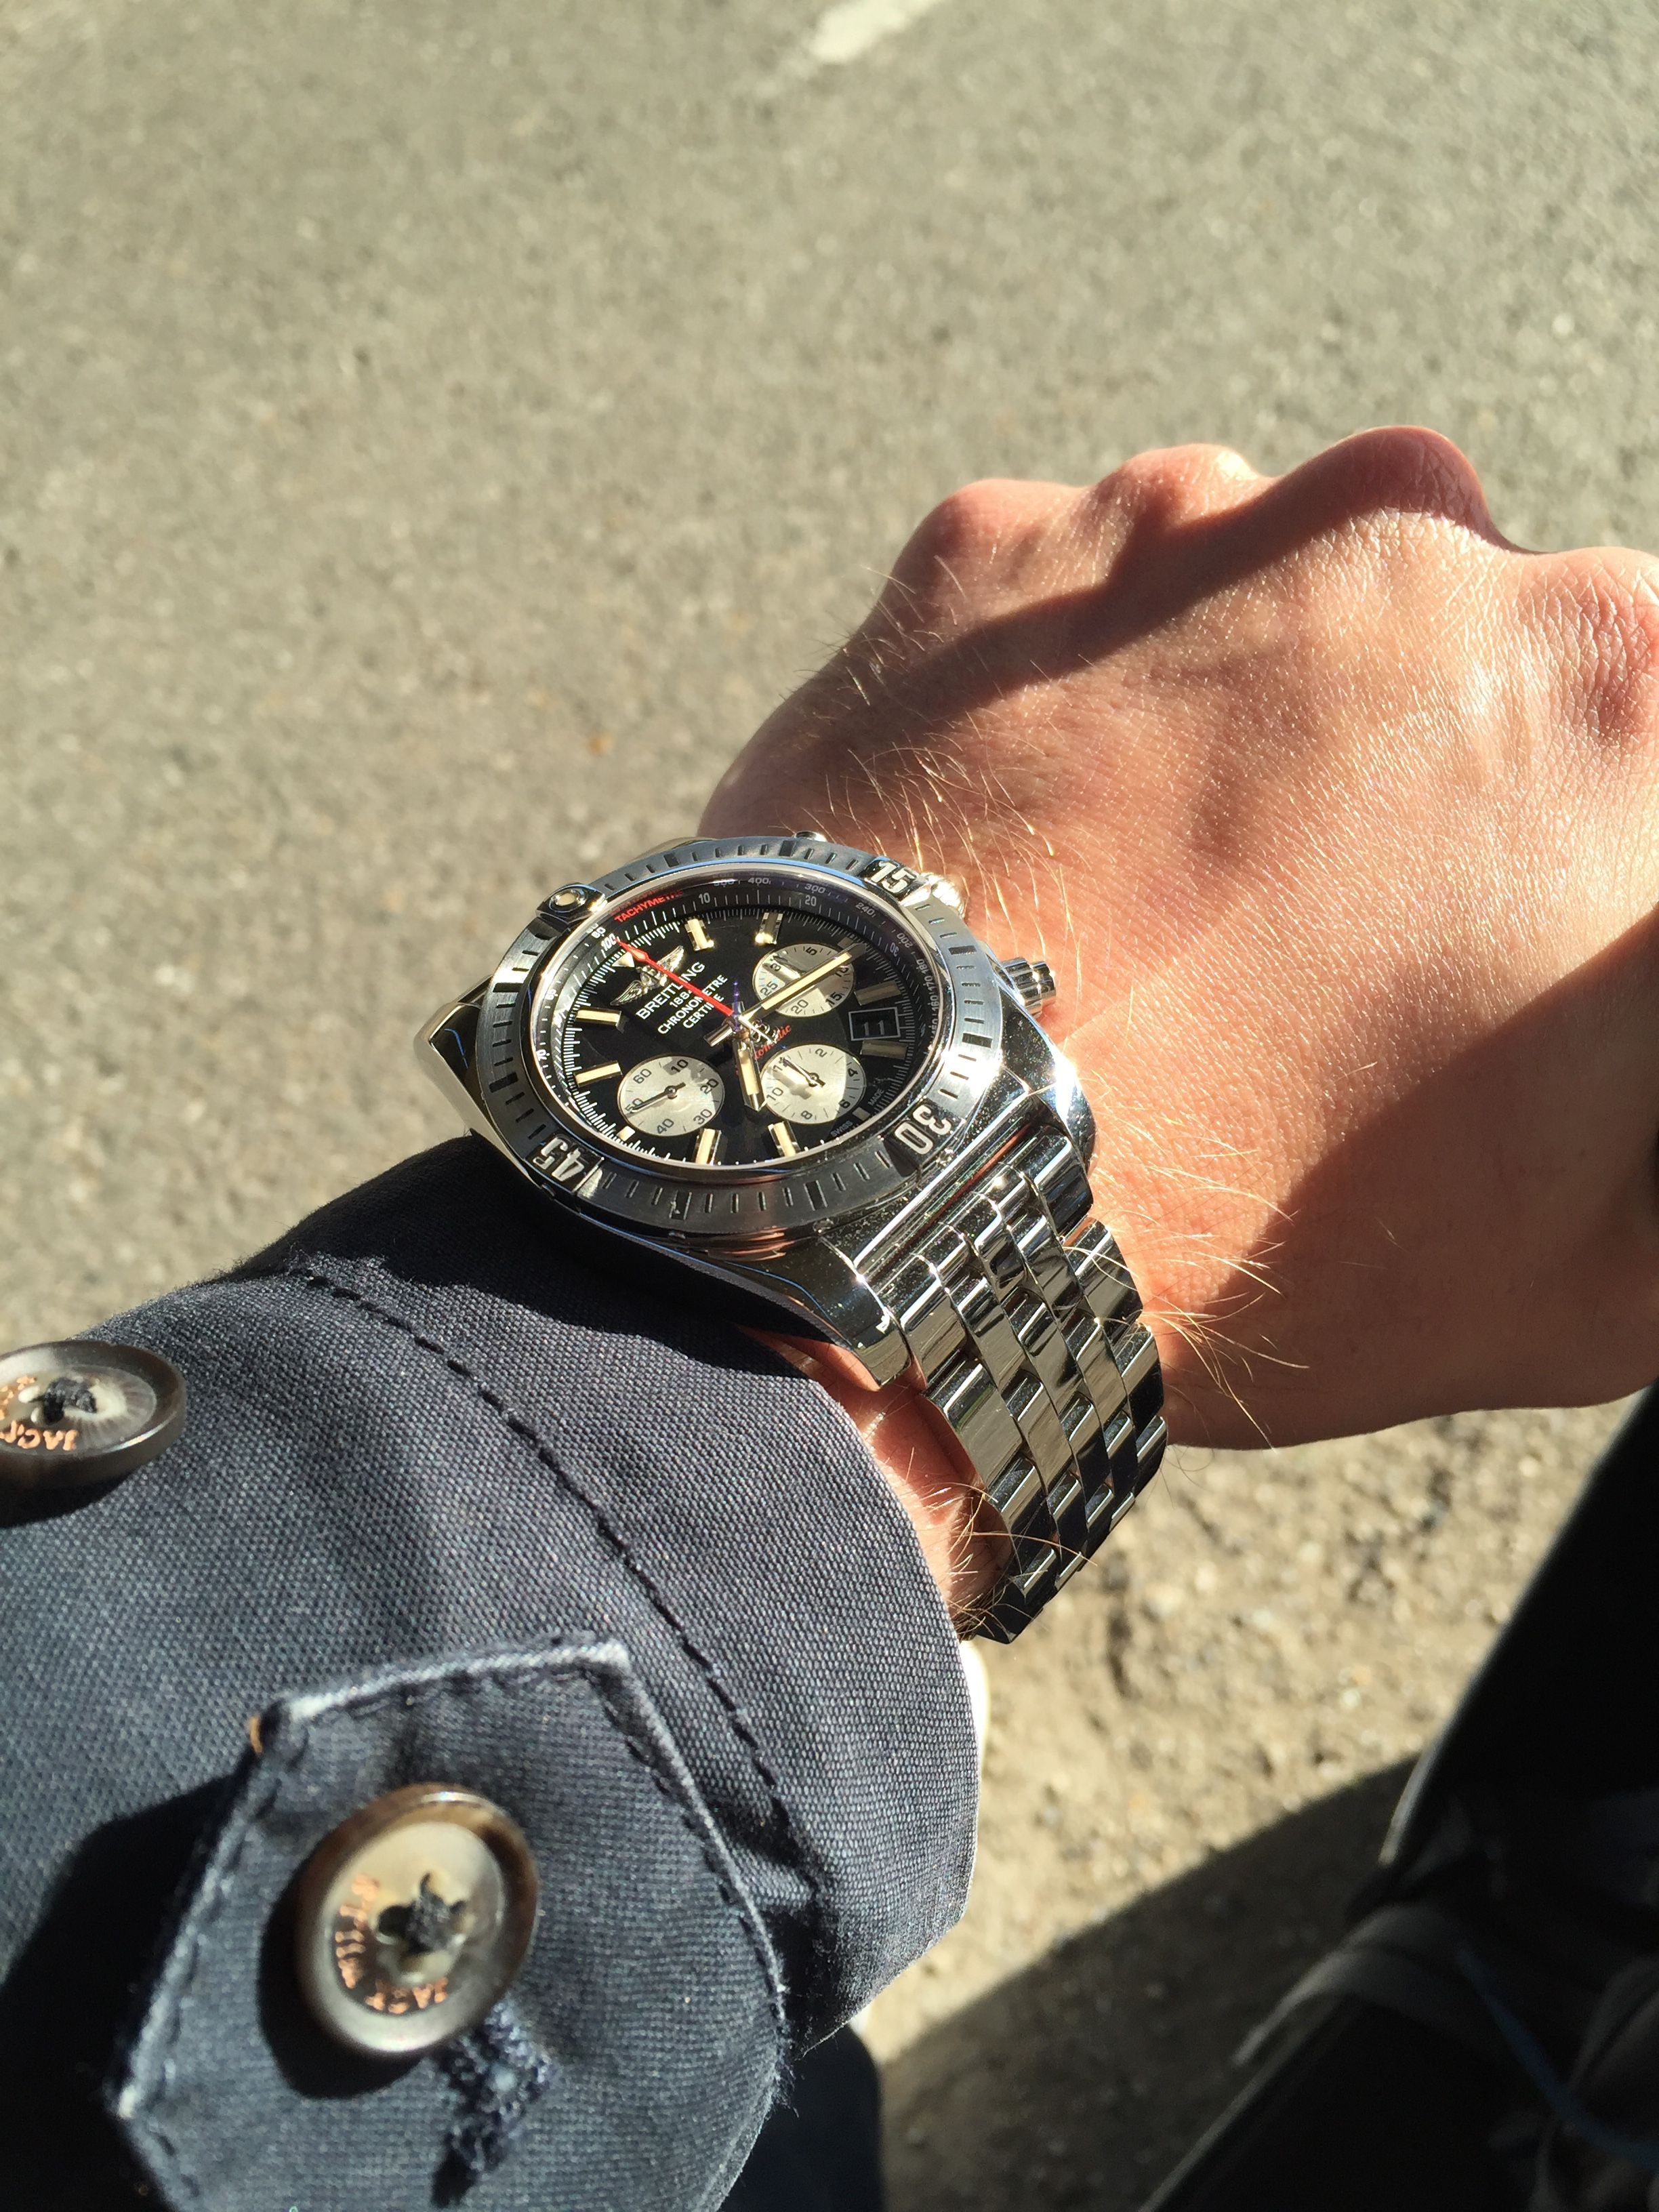 Breitling chronomat 44 airborne Watches v roce 2018